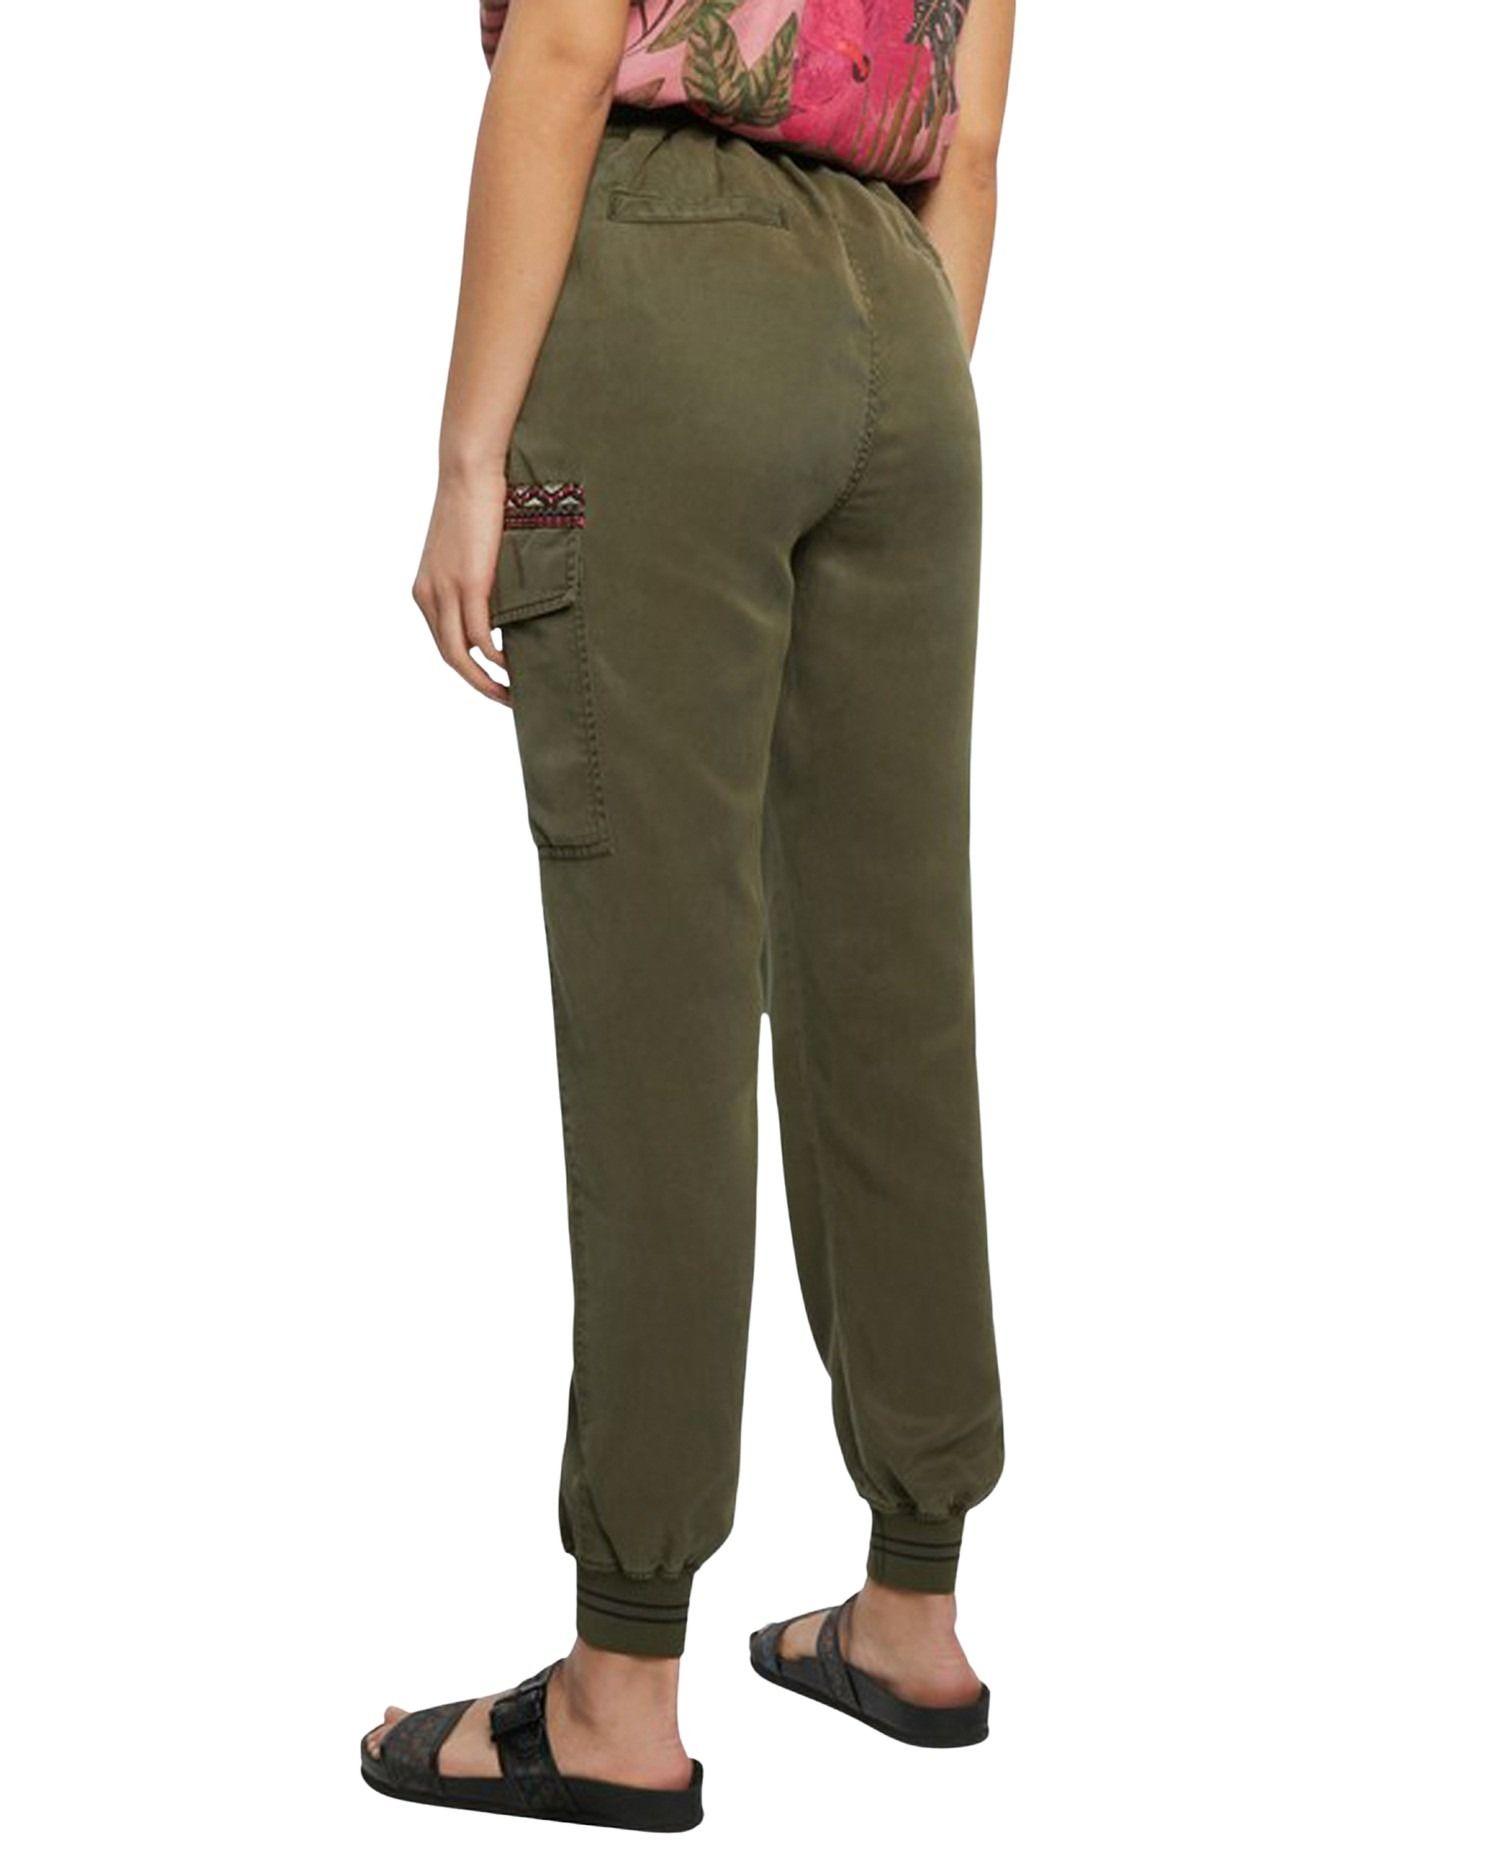 DESIGUAL Pants DESIGUAL WOMEN'S GREEN POLYAMIDE PANTS